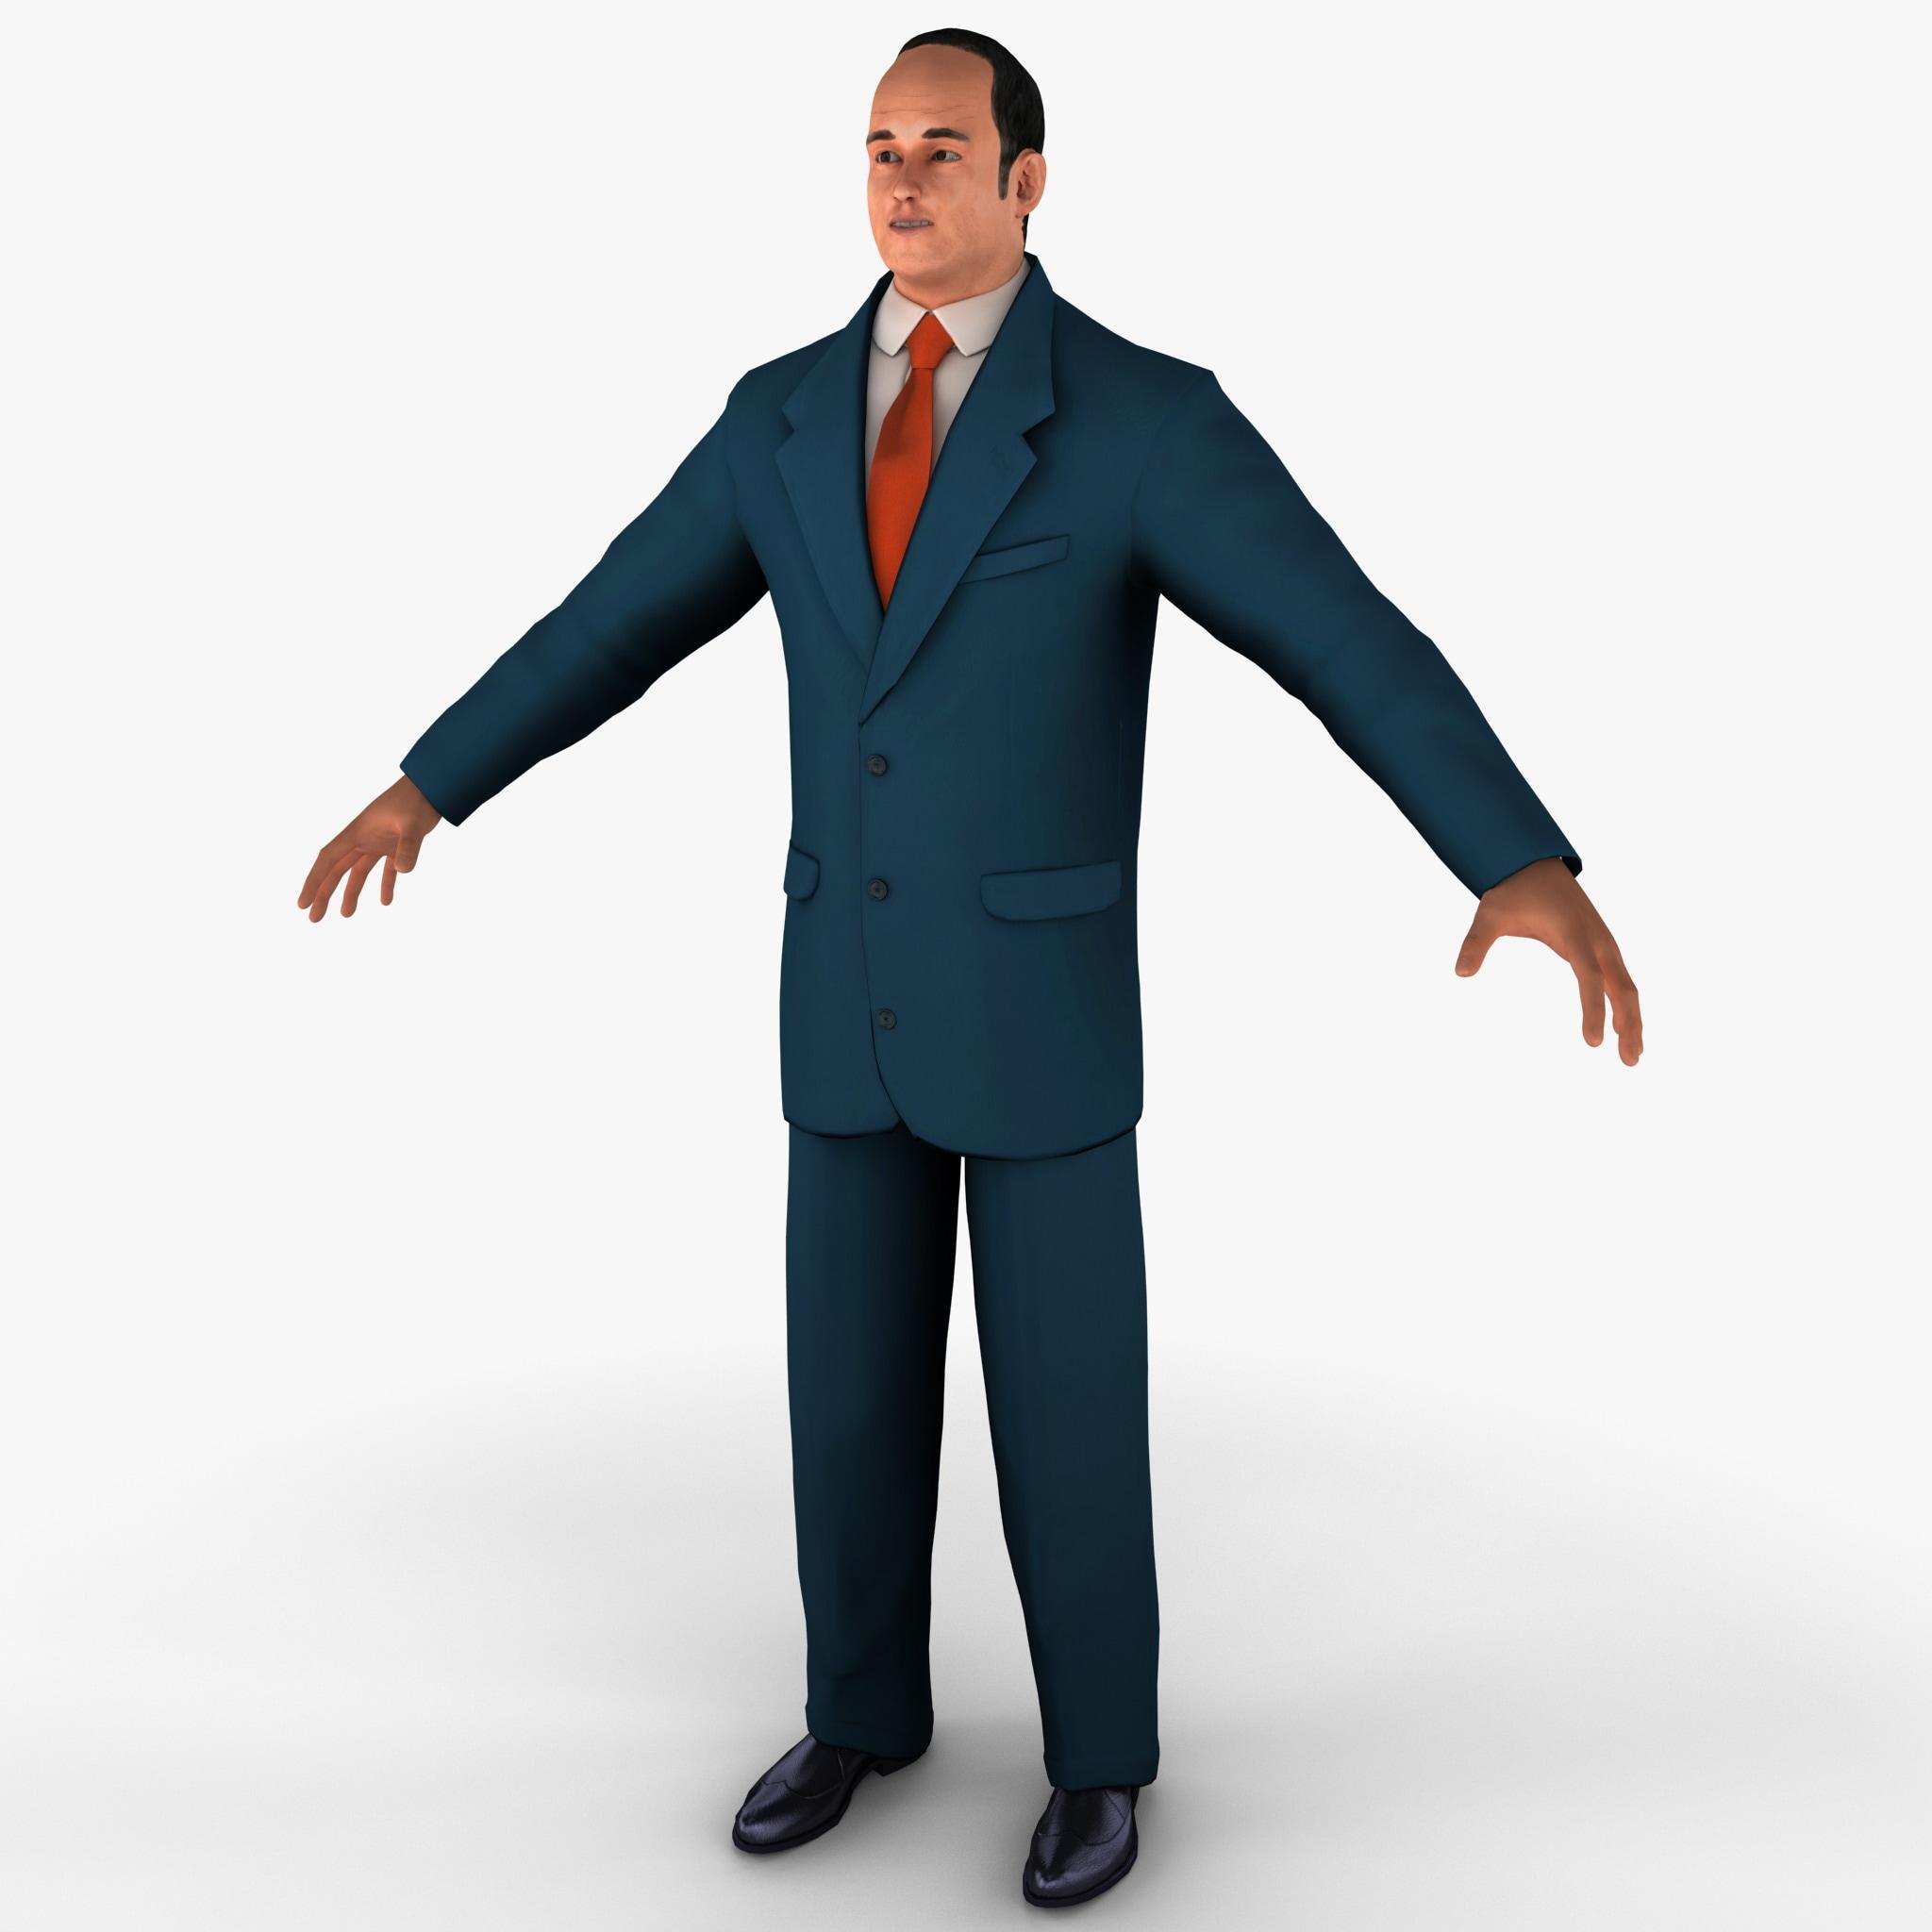 businessman 3 business 3d model